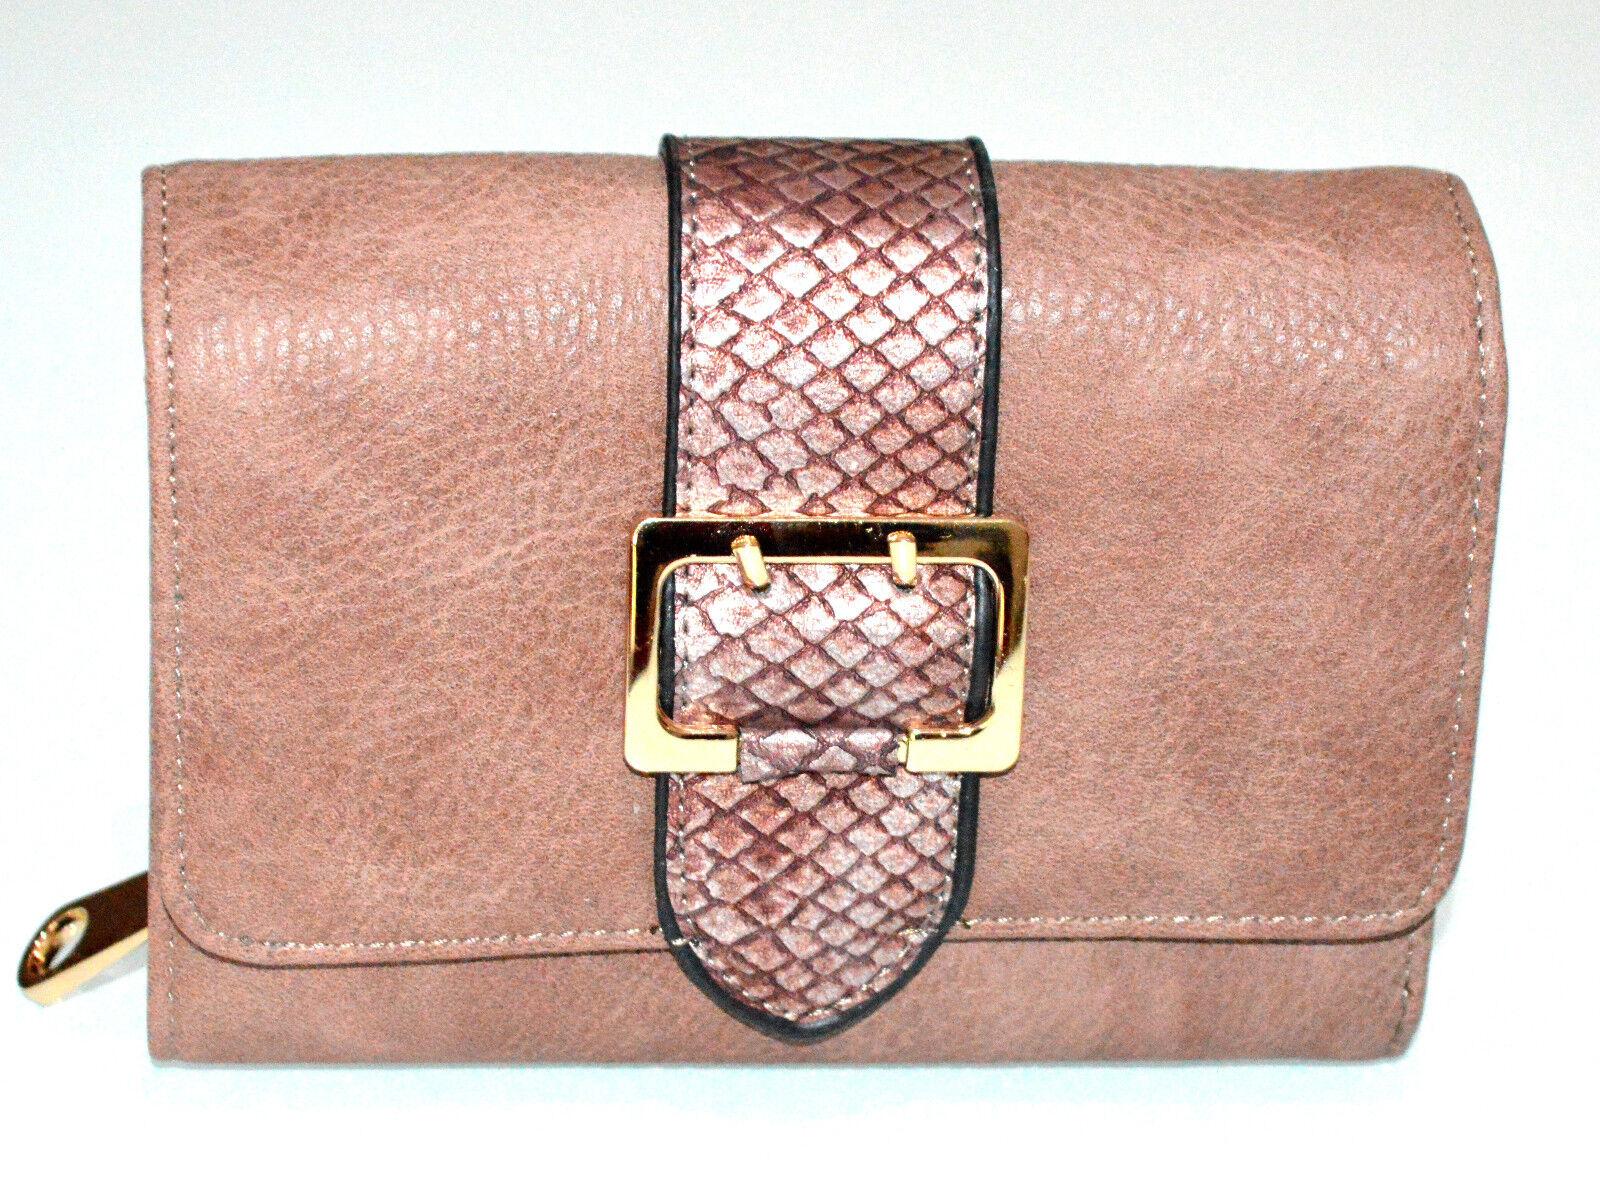 Ladies Pink Wallet Beige Gold Buckle Hand Bag Coin Purse Clutch g1